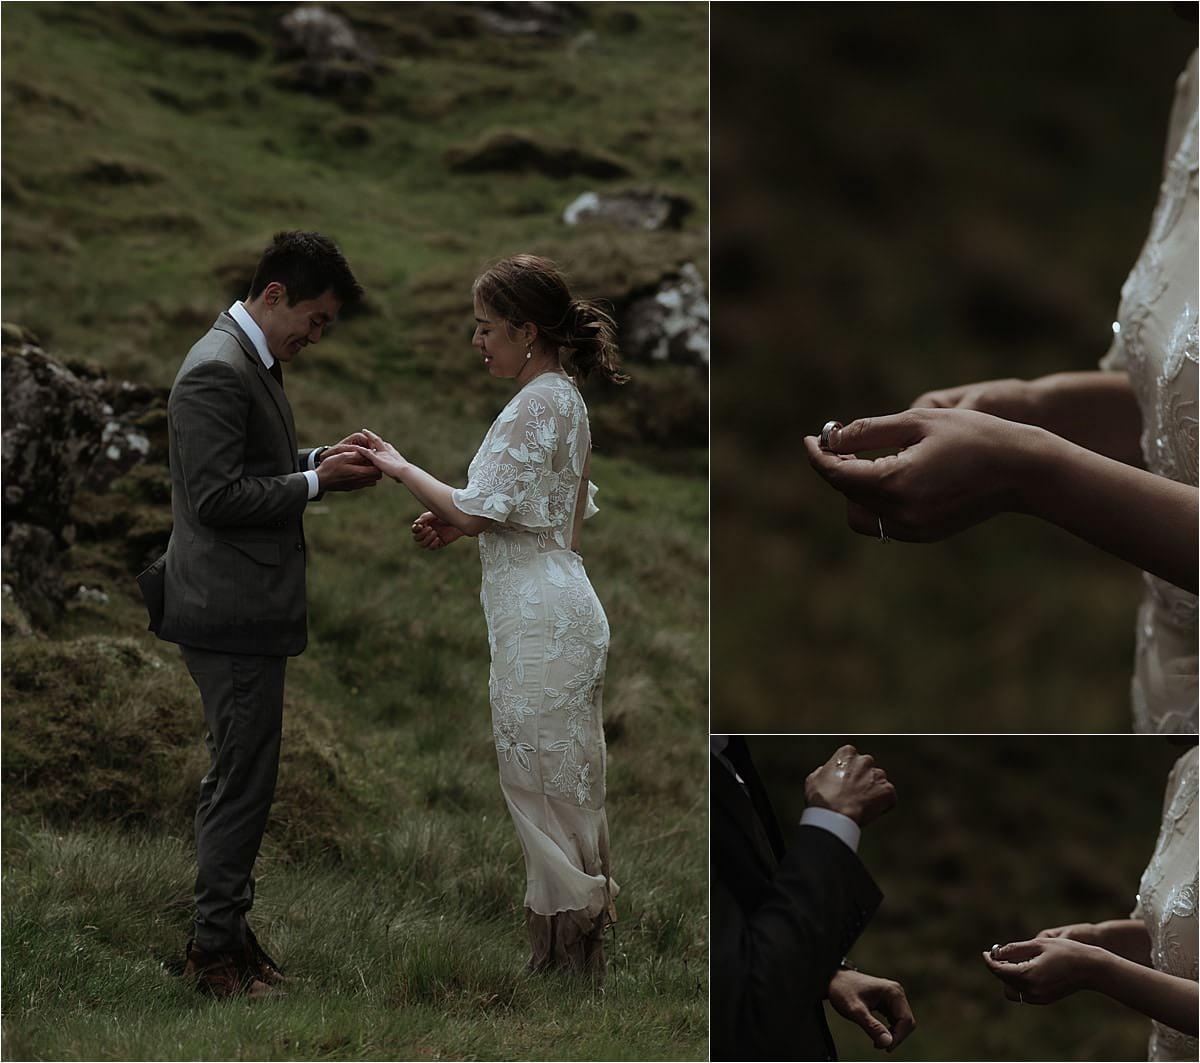 Scottish elopement by sean bell photographer